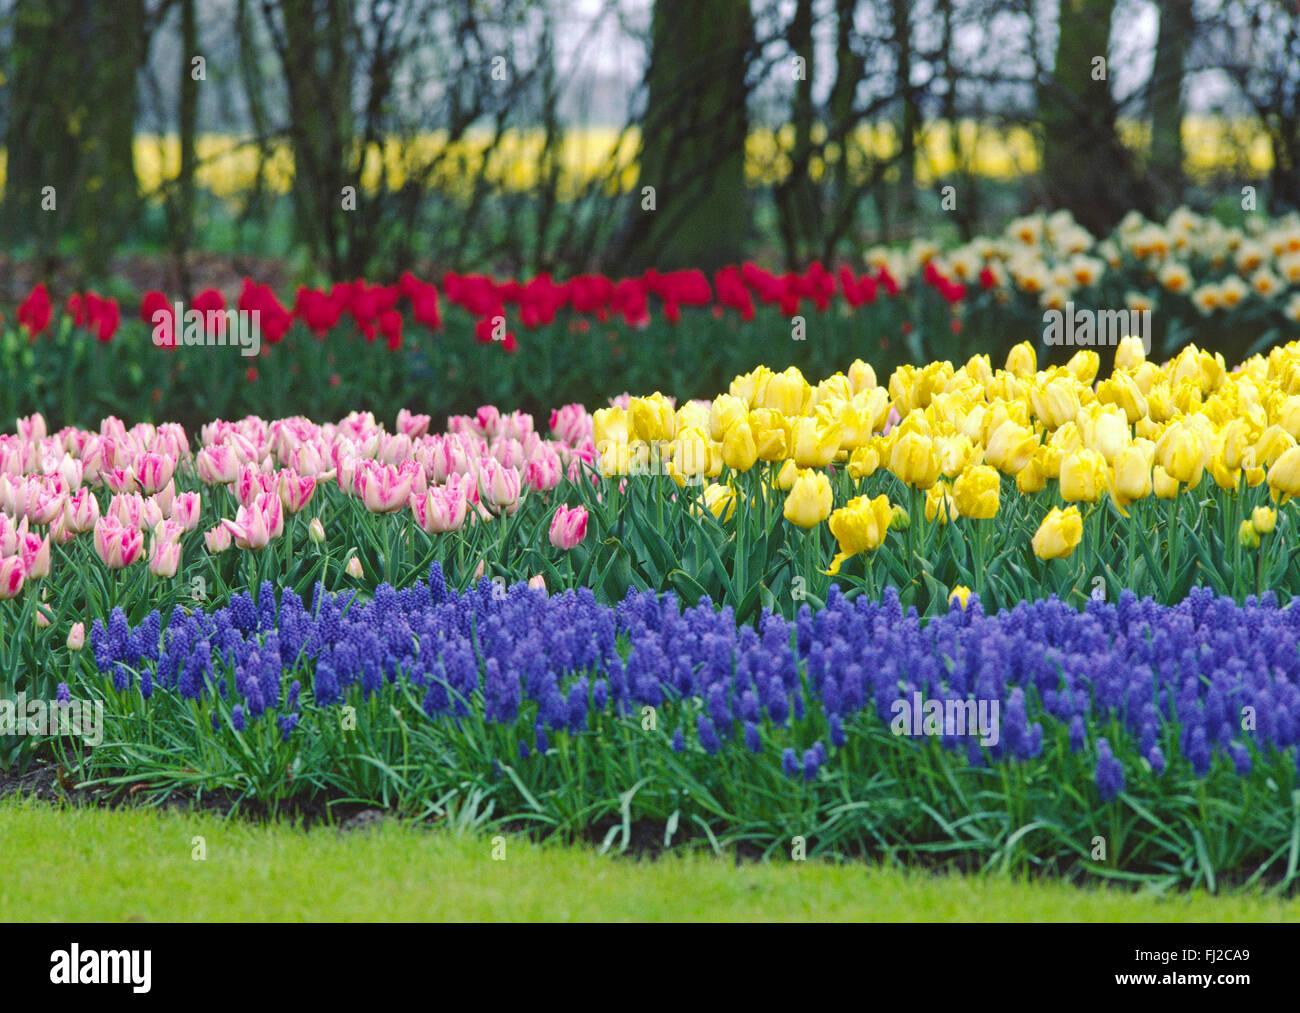 NIEDERLANDE, HOLLAND, TULPEN, BLUMEN, FELD, FELDER, TULPENBLUETE, KEUKENHOF, - Stock Image